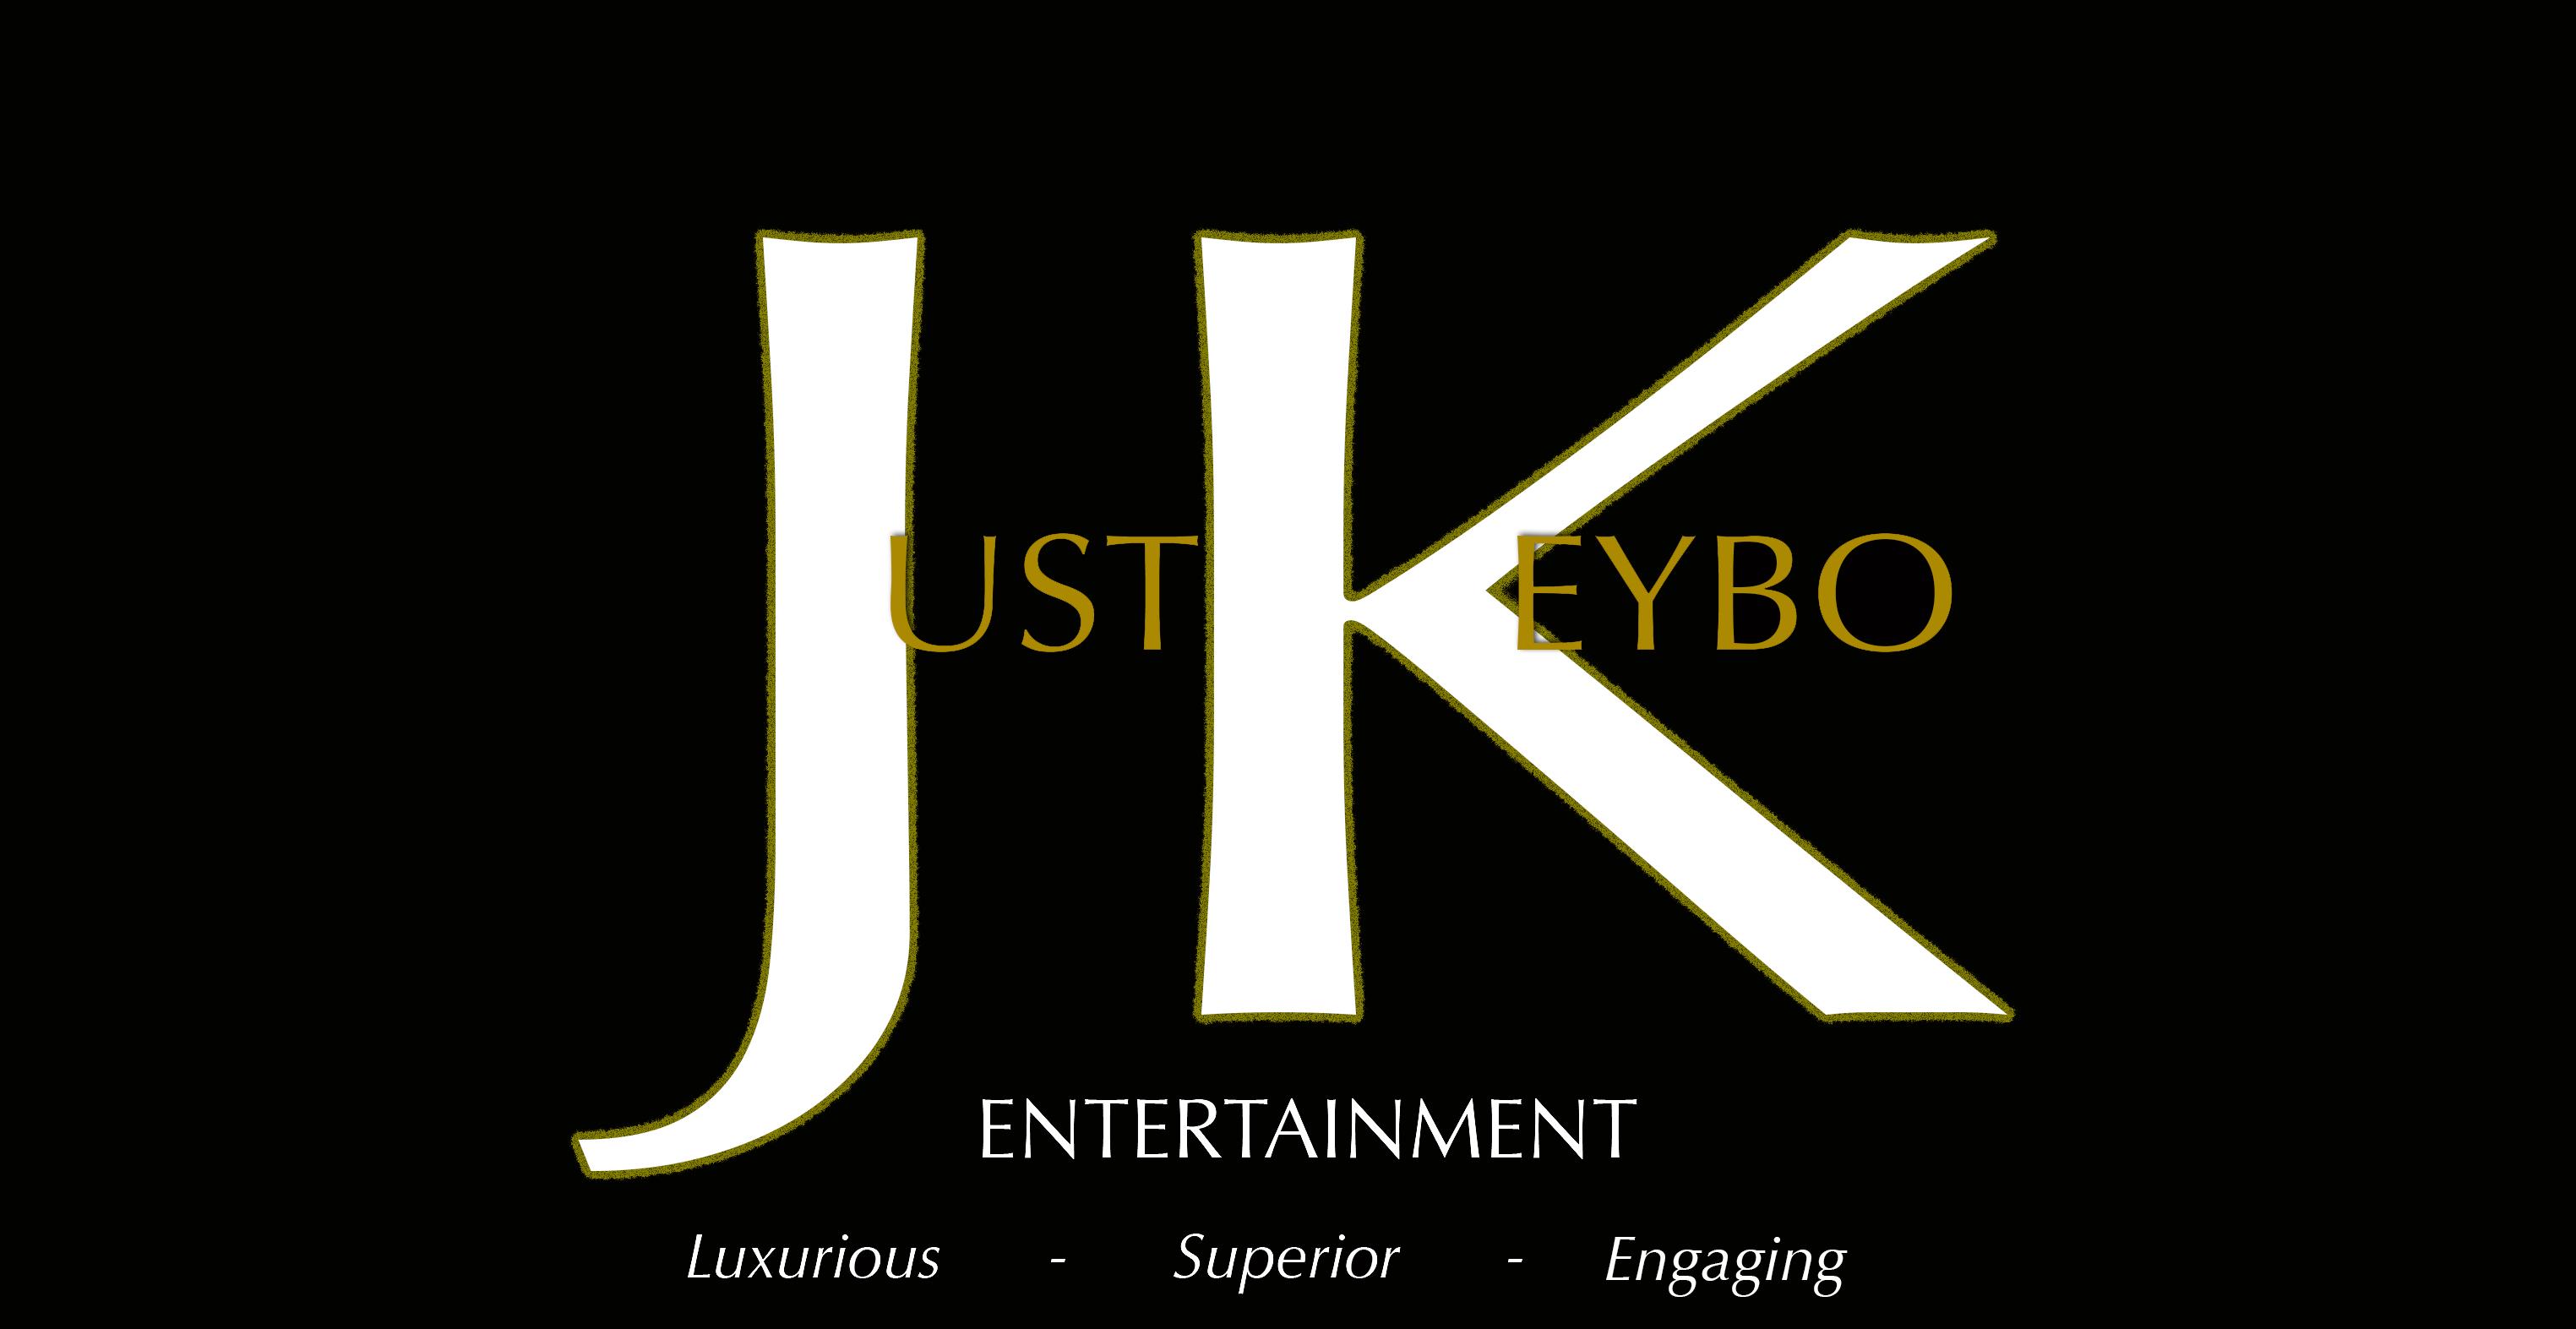 JustKeybo Entertainment - JustKeybo Entertainment